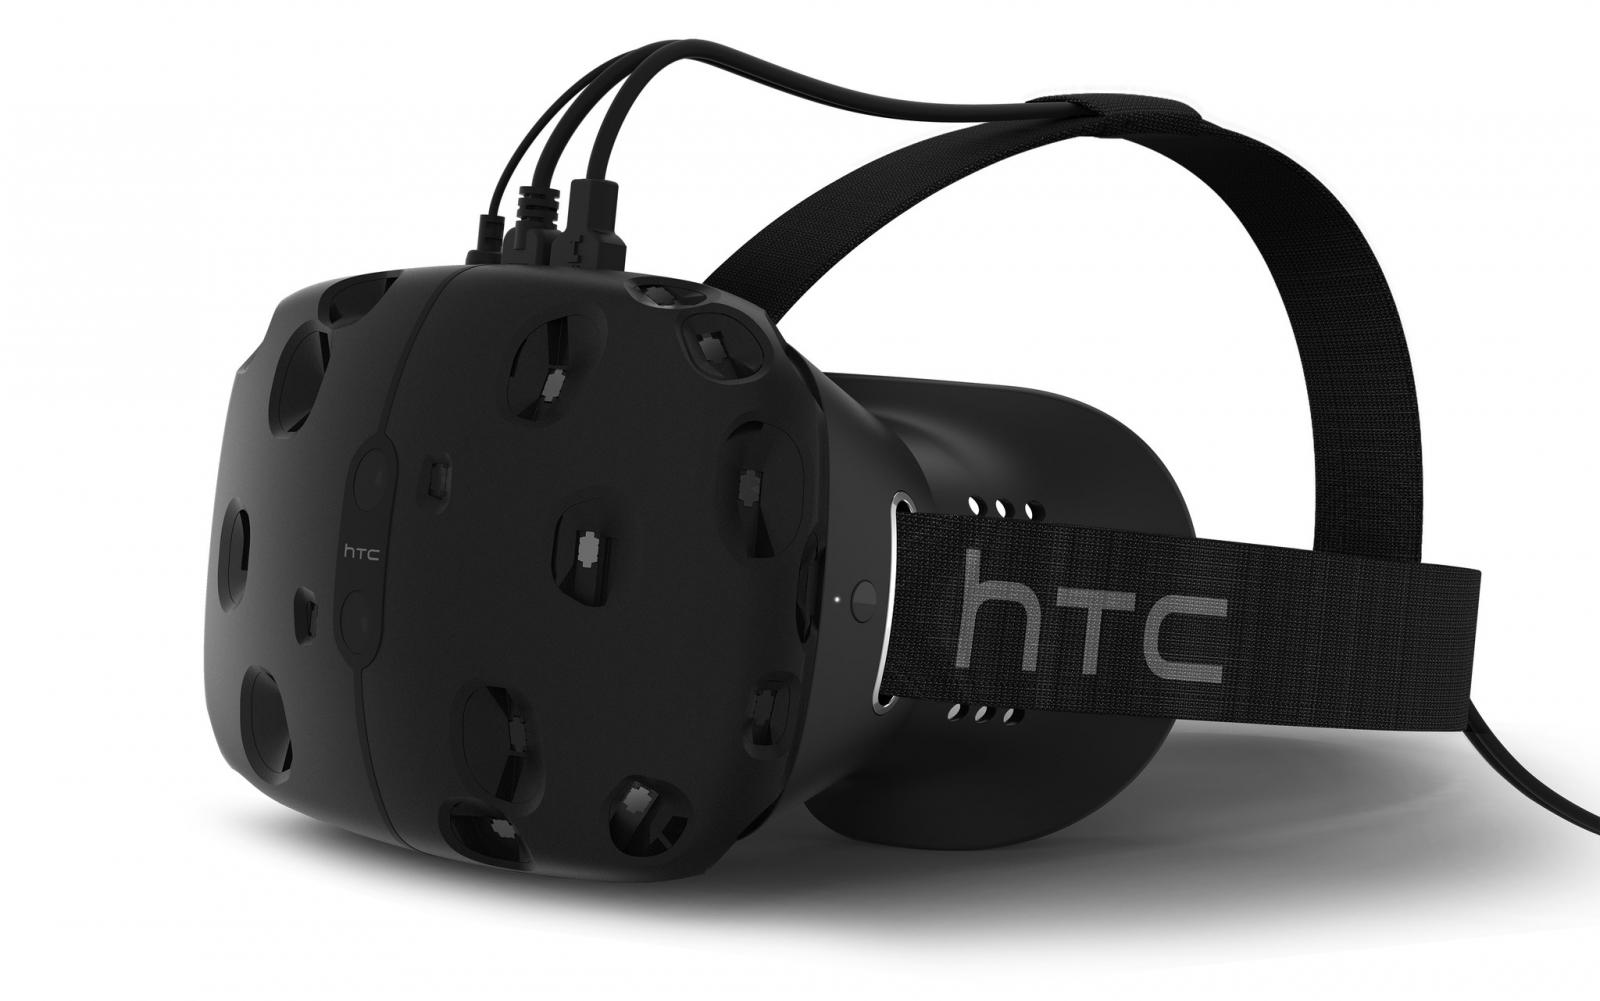 HTC Vive headset Valve